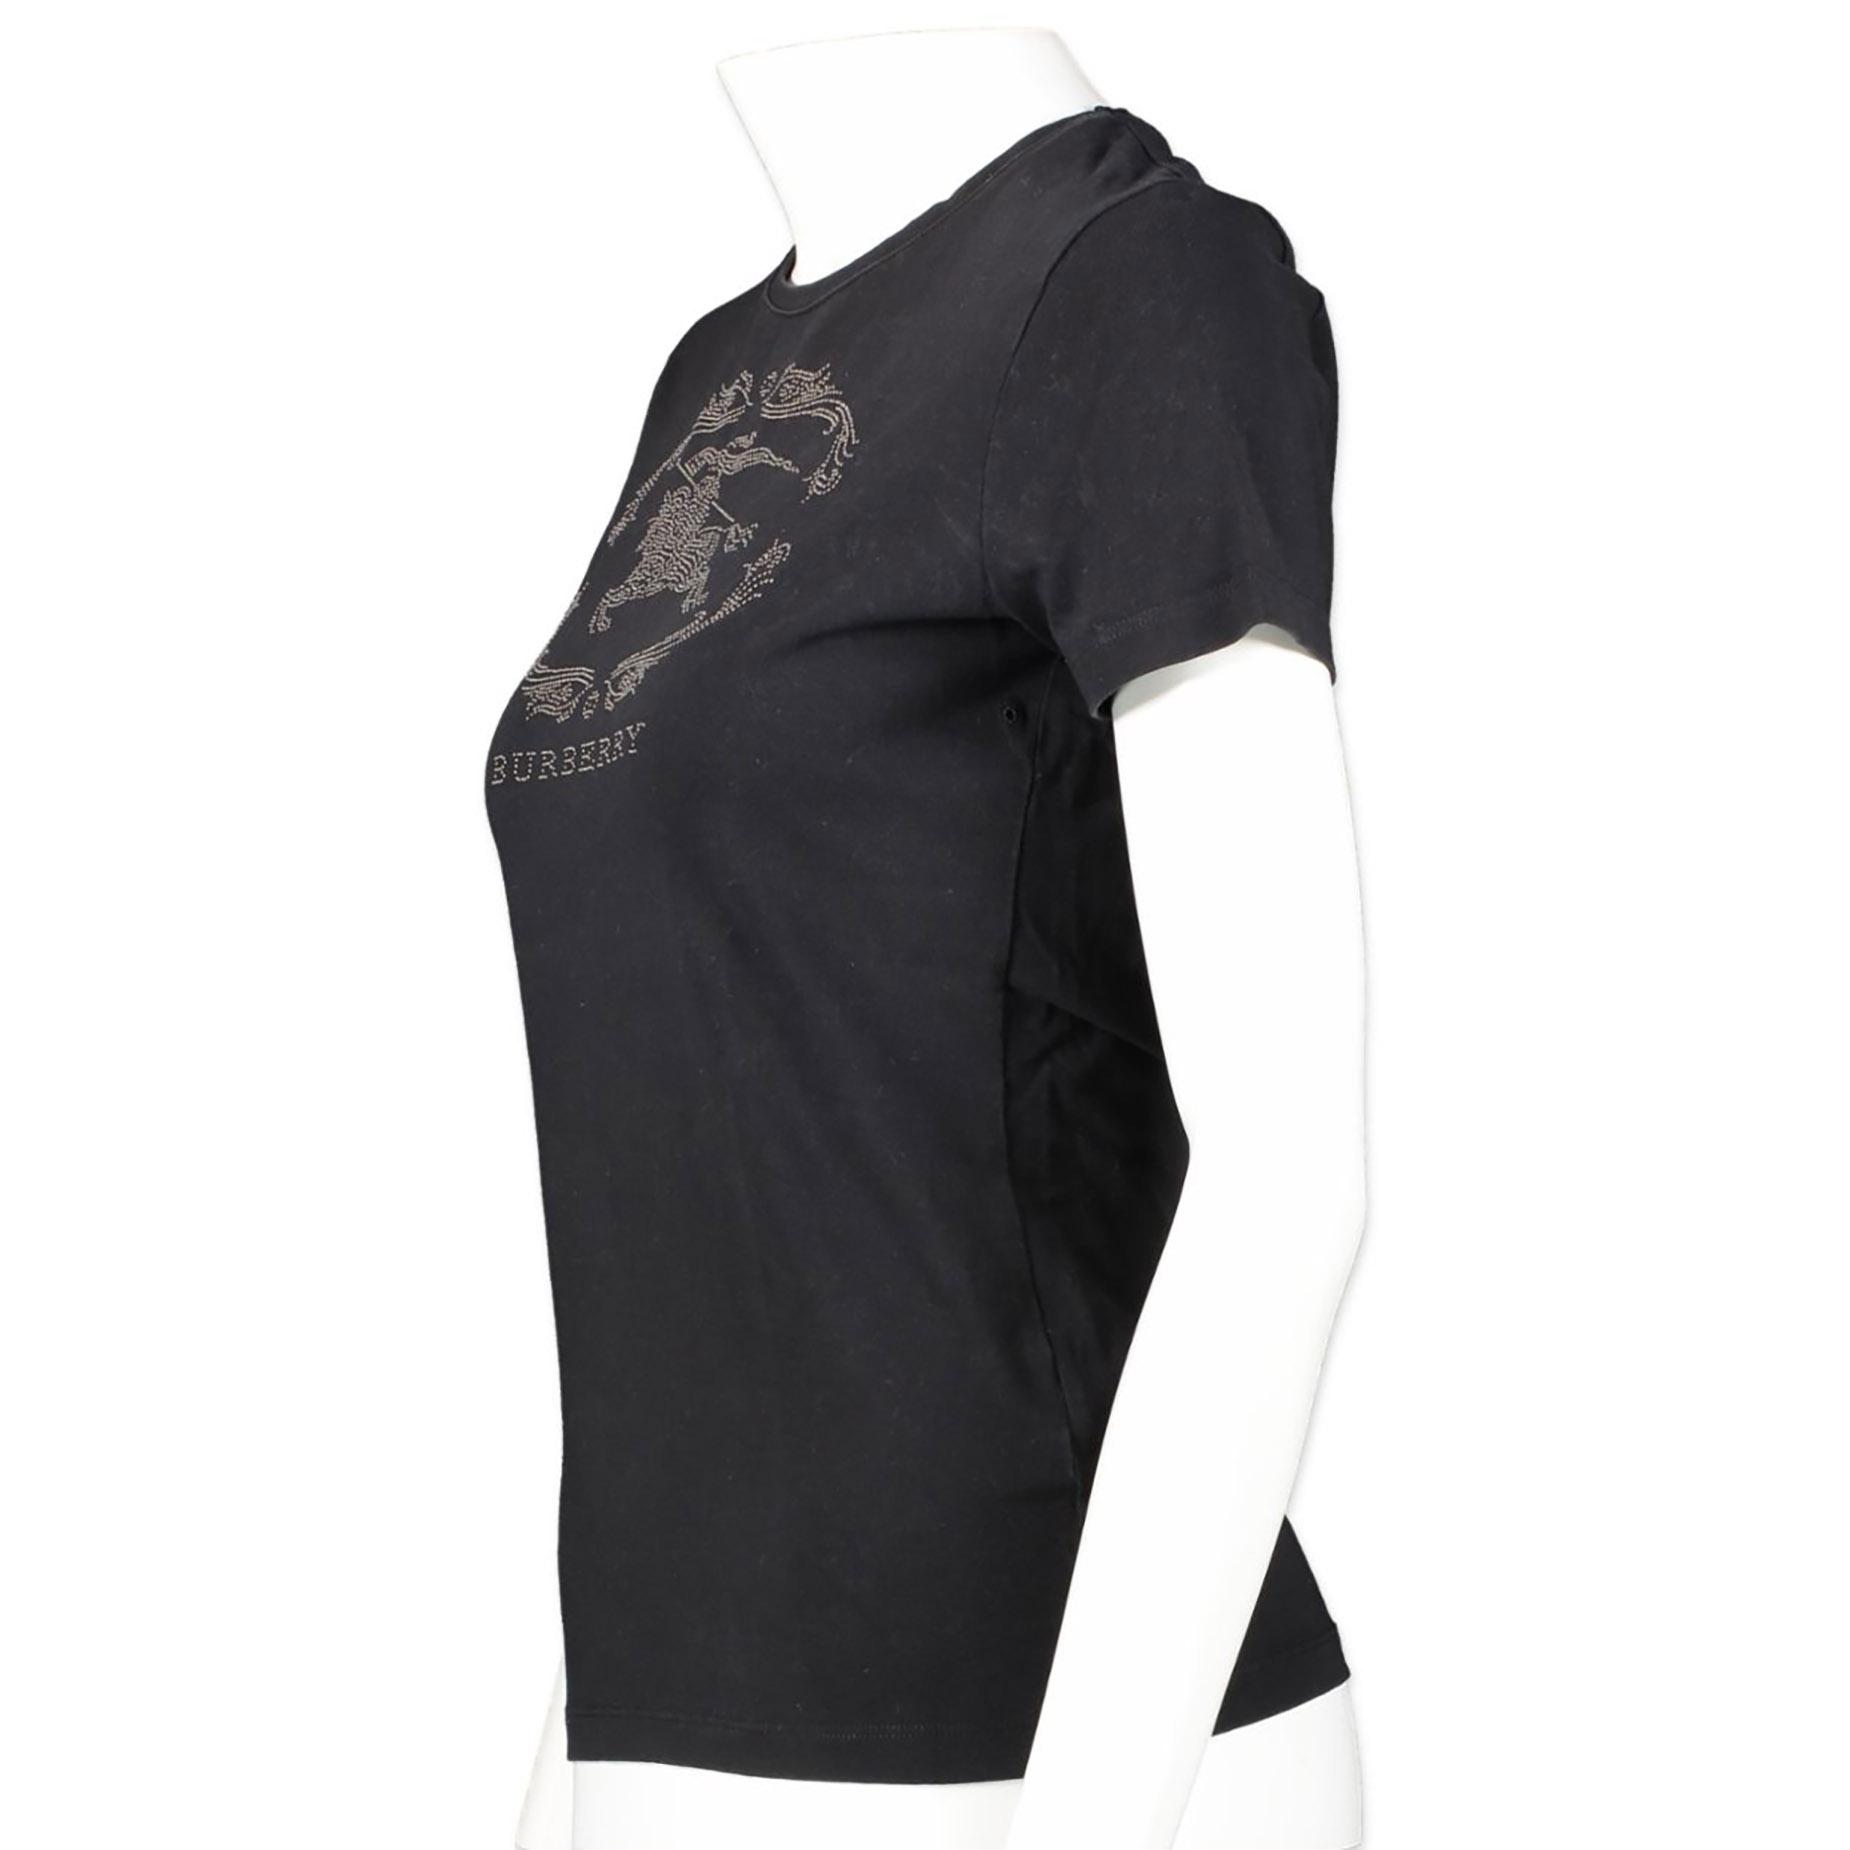 Authentieke tweedehands vintage Burberry Rhinestone Black T-shirt - Size S koop online webshop LabelLOV